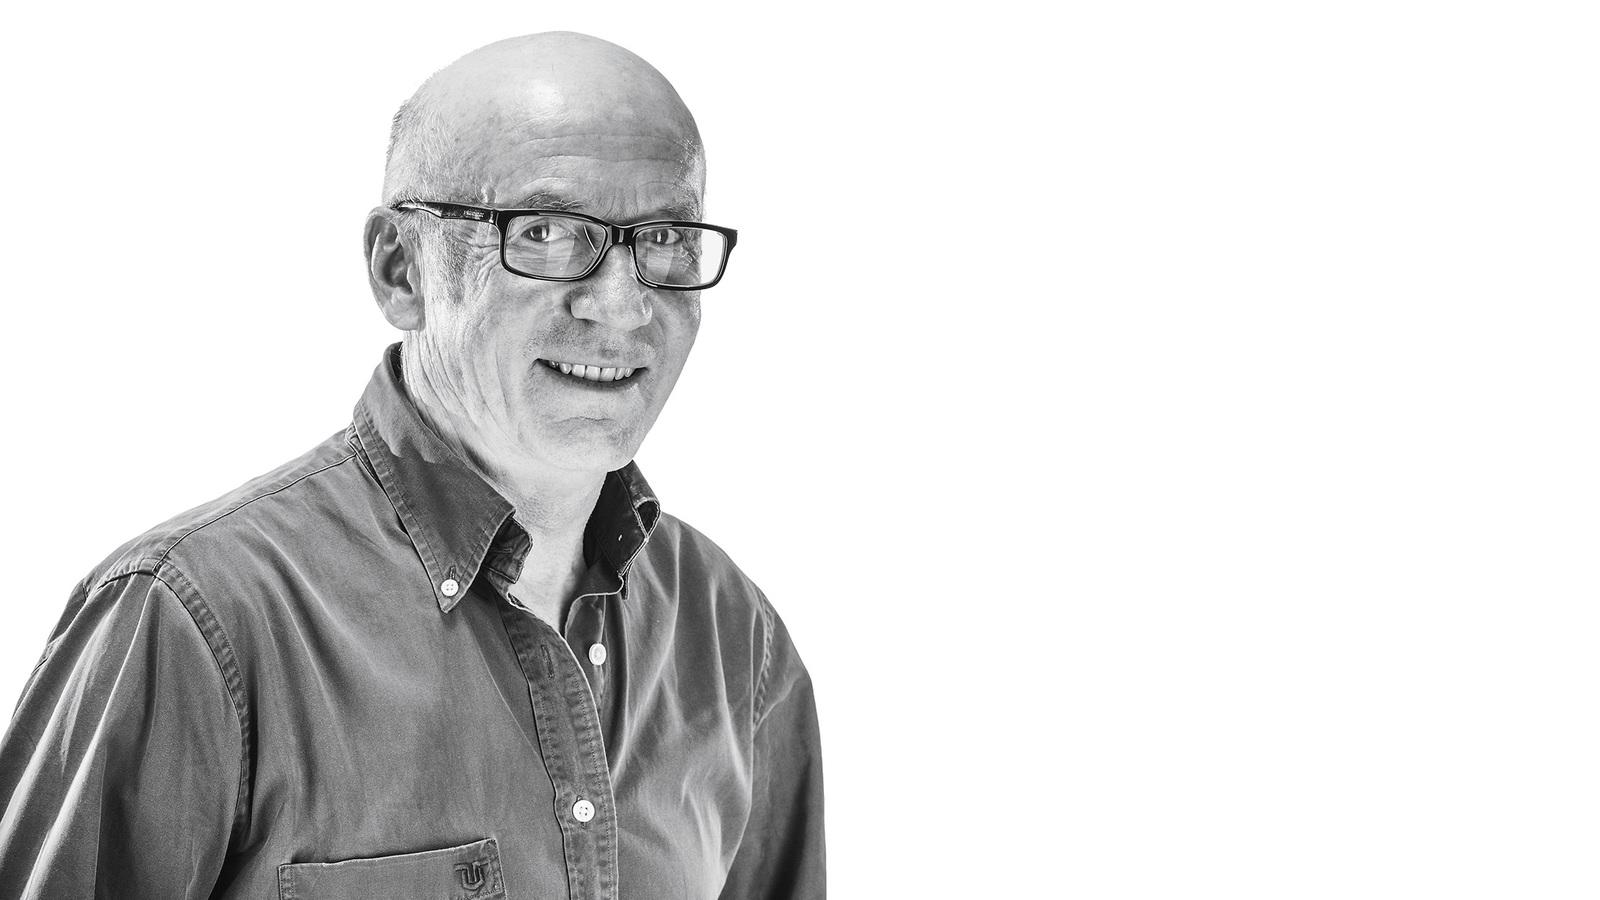 CENTURION Founder Wolfgang Renner nominated for Hall of Fame